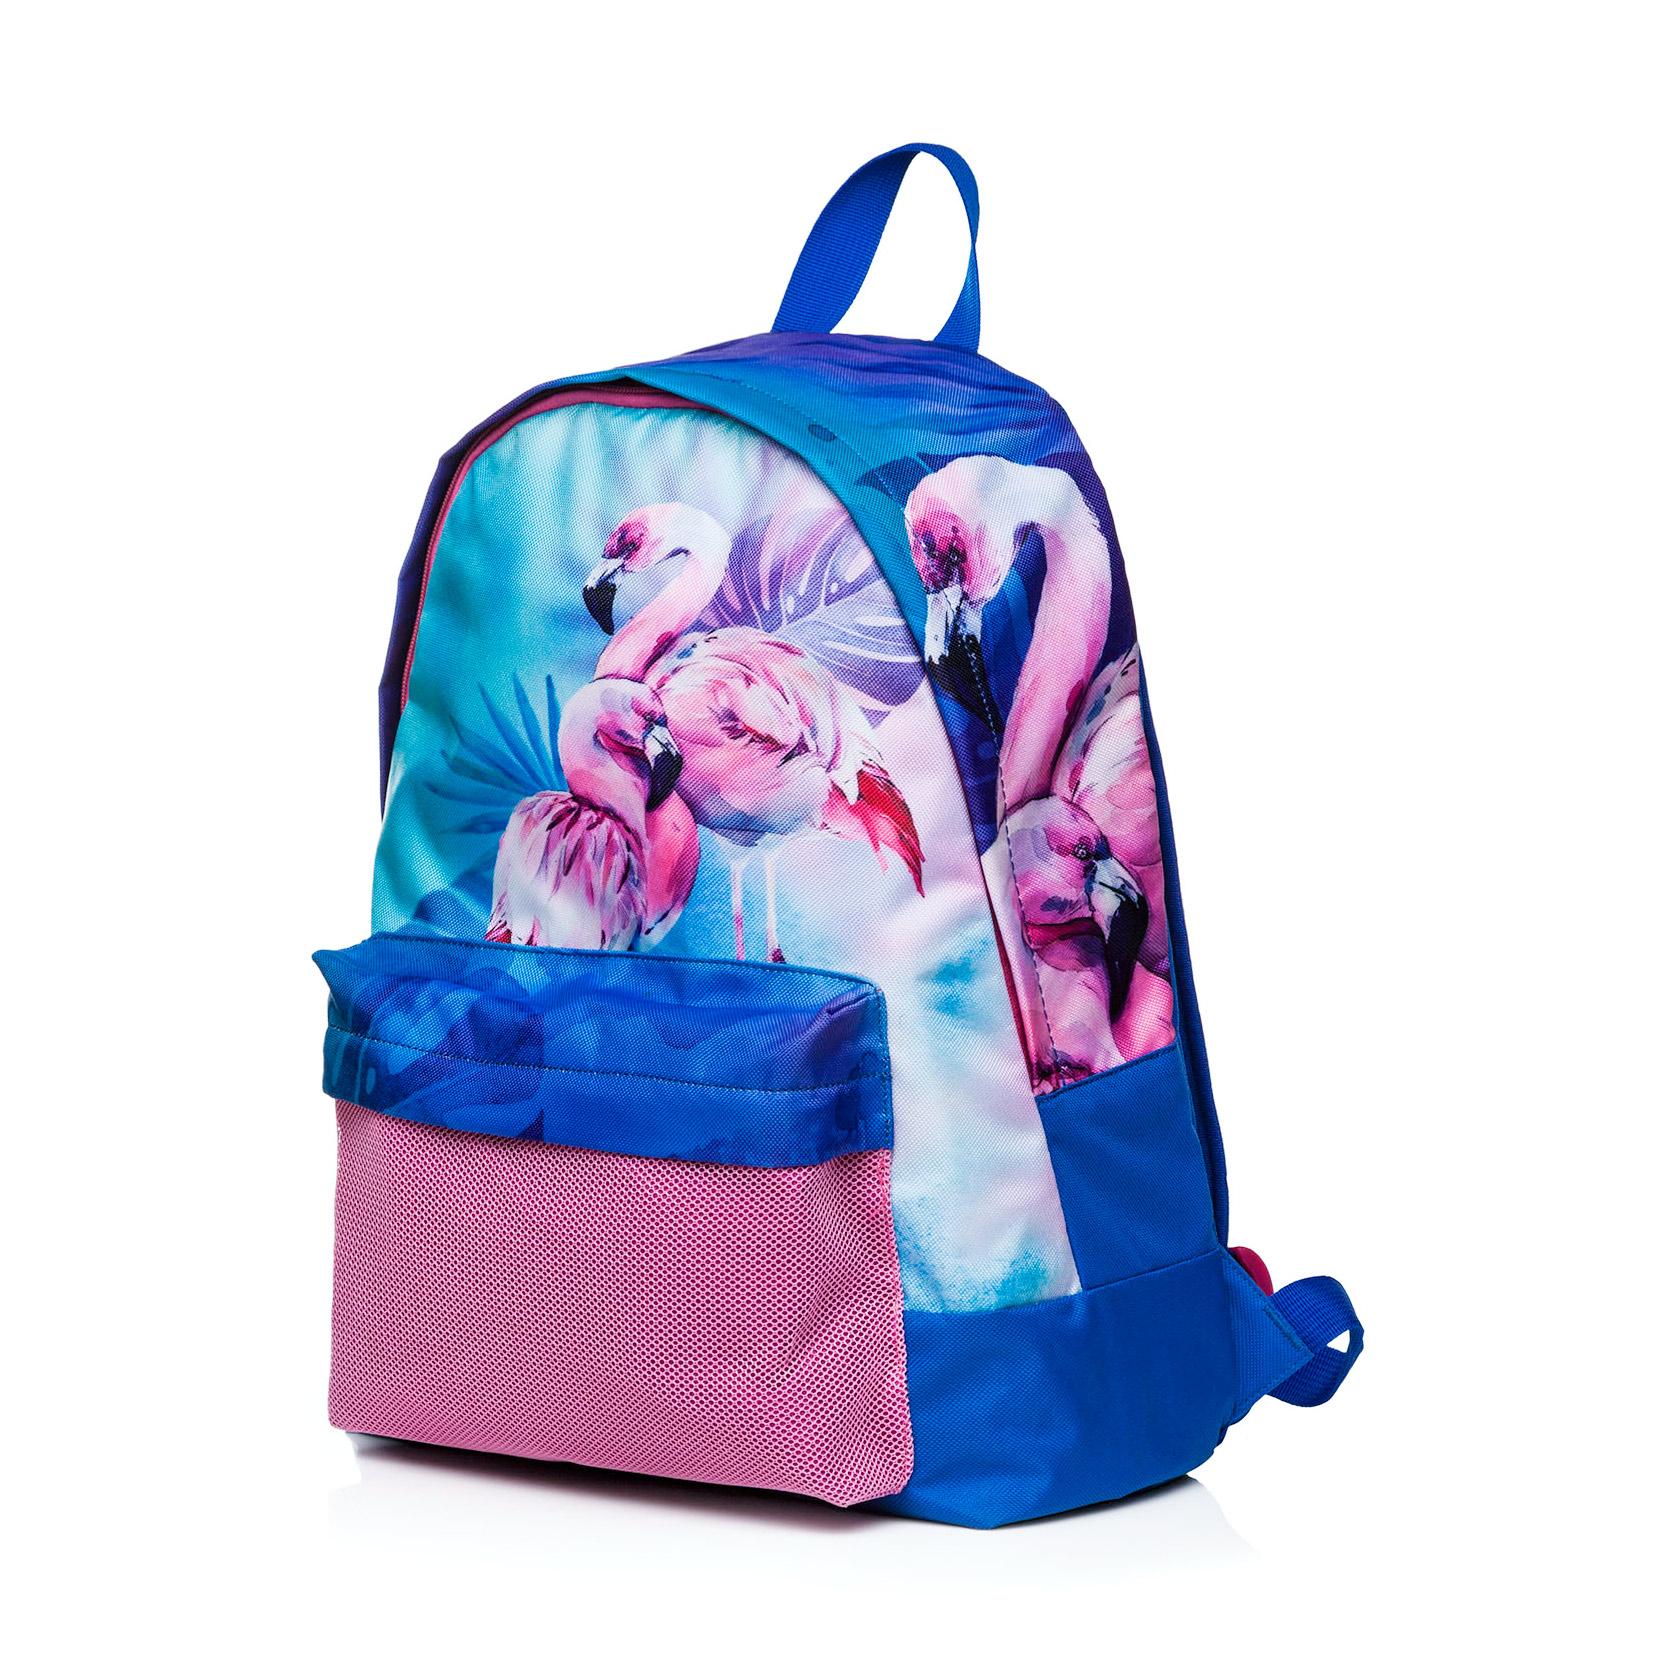 Рюкзак Hatber BASIC Фламинго 30x41x13 см